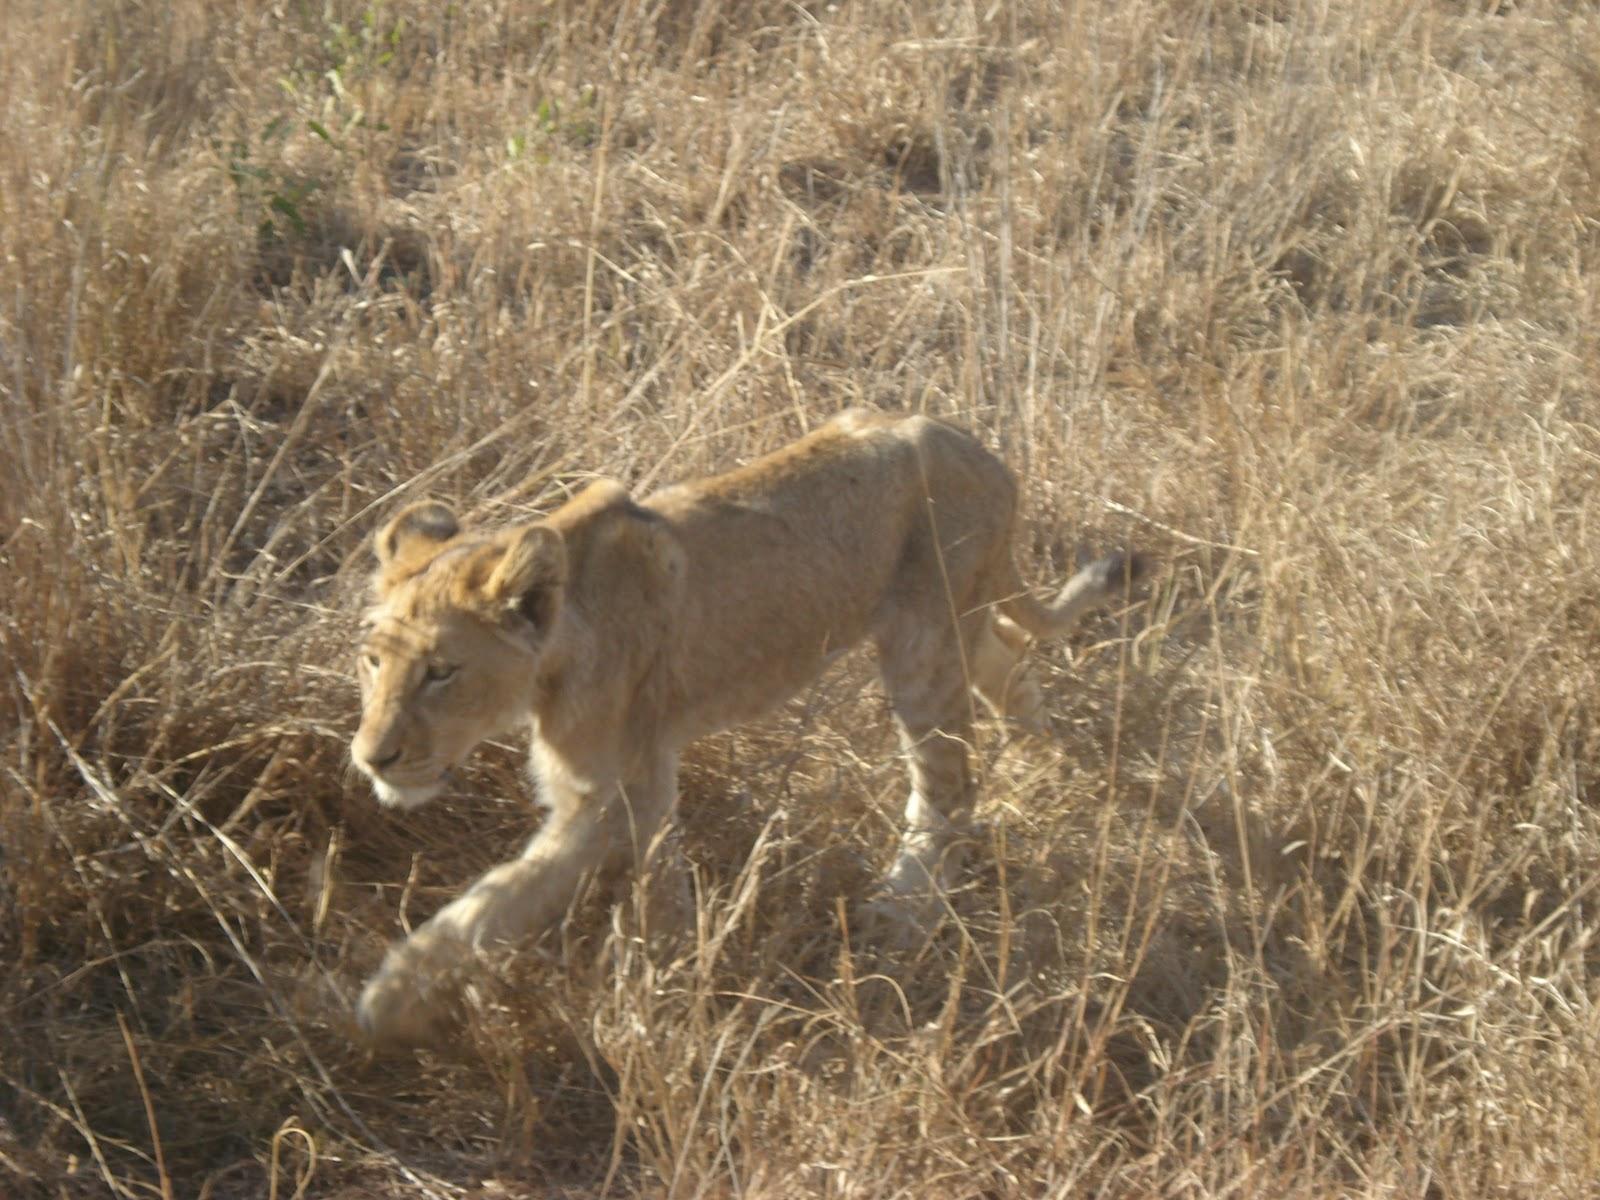 Honey badger vs lion testicles - photo#18